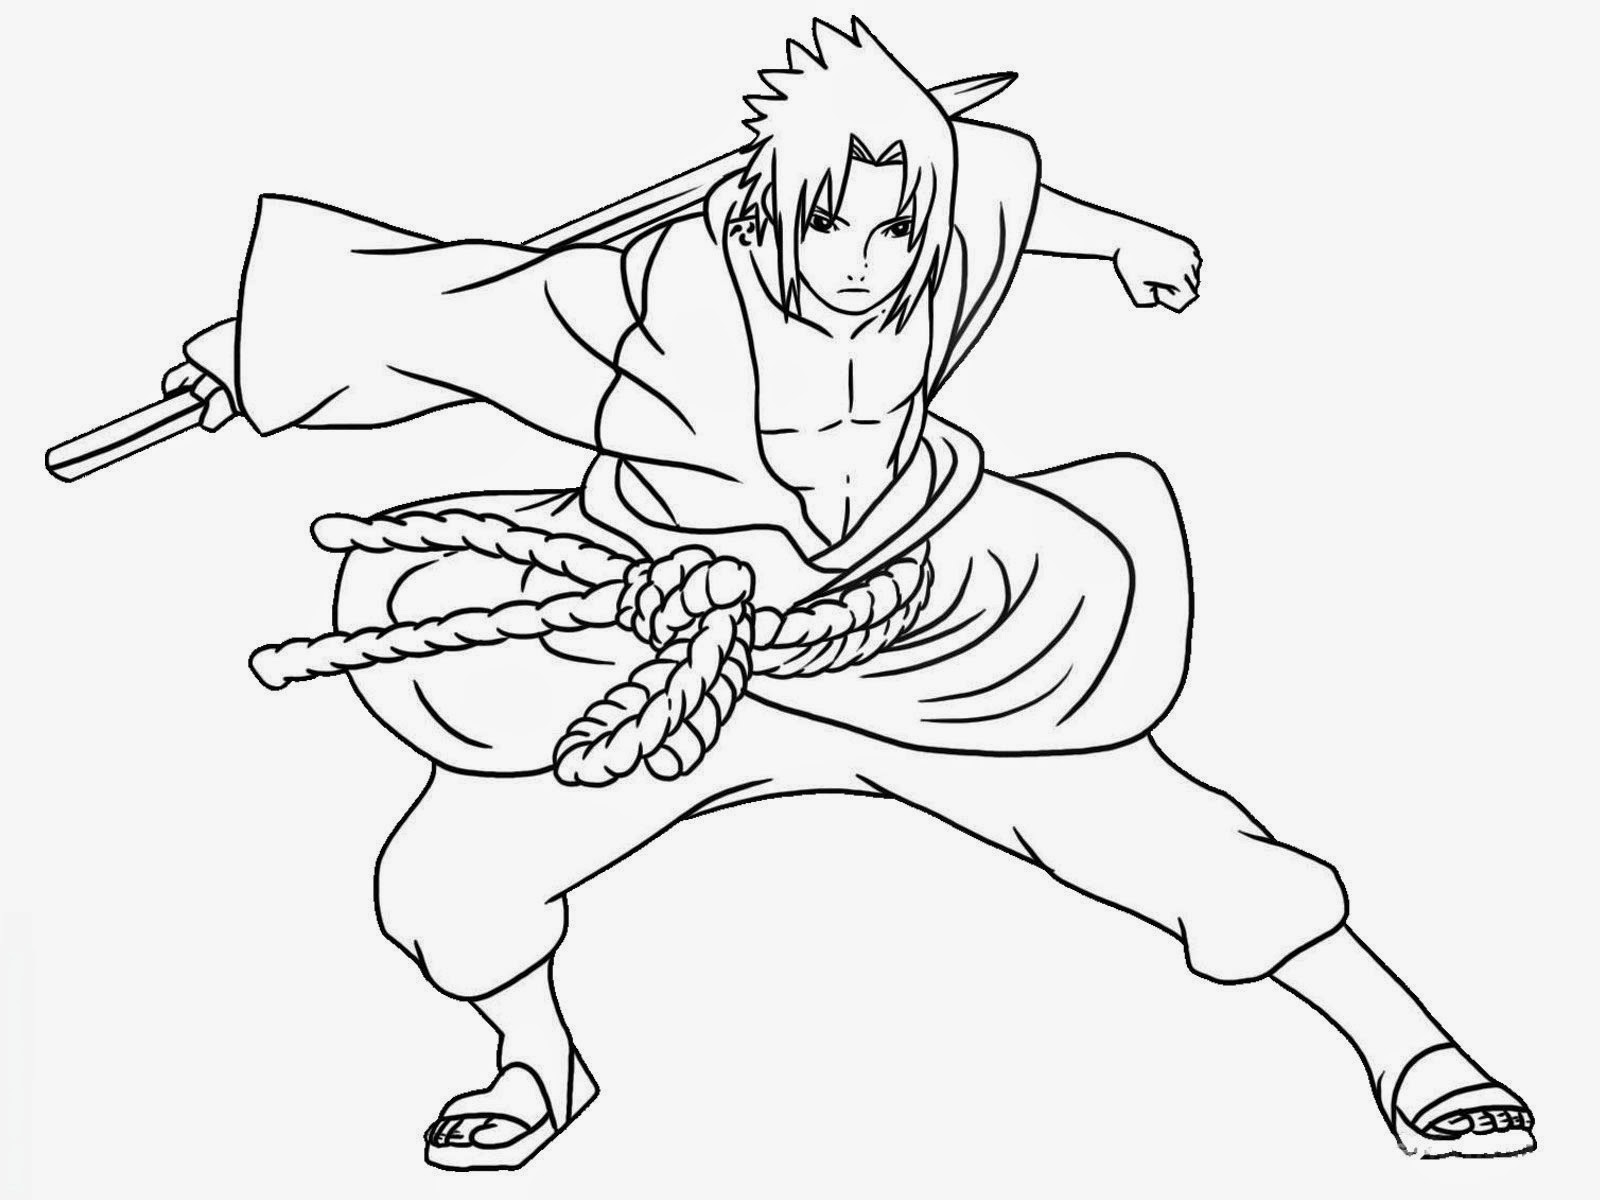 Gambar Mewarnai Naruto Gambar Mewarnai Lucu